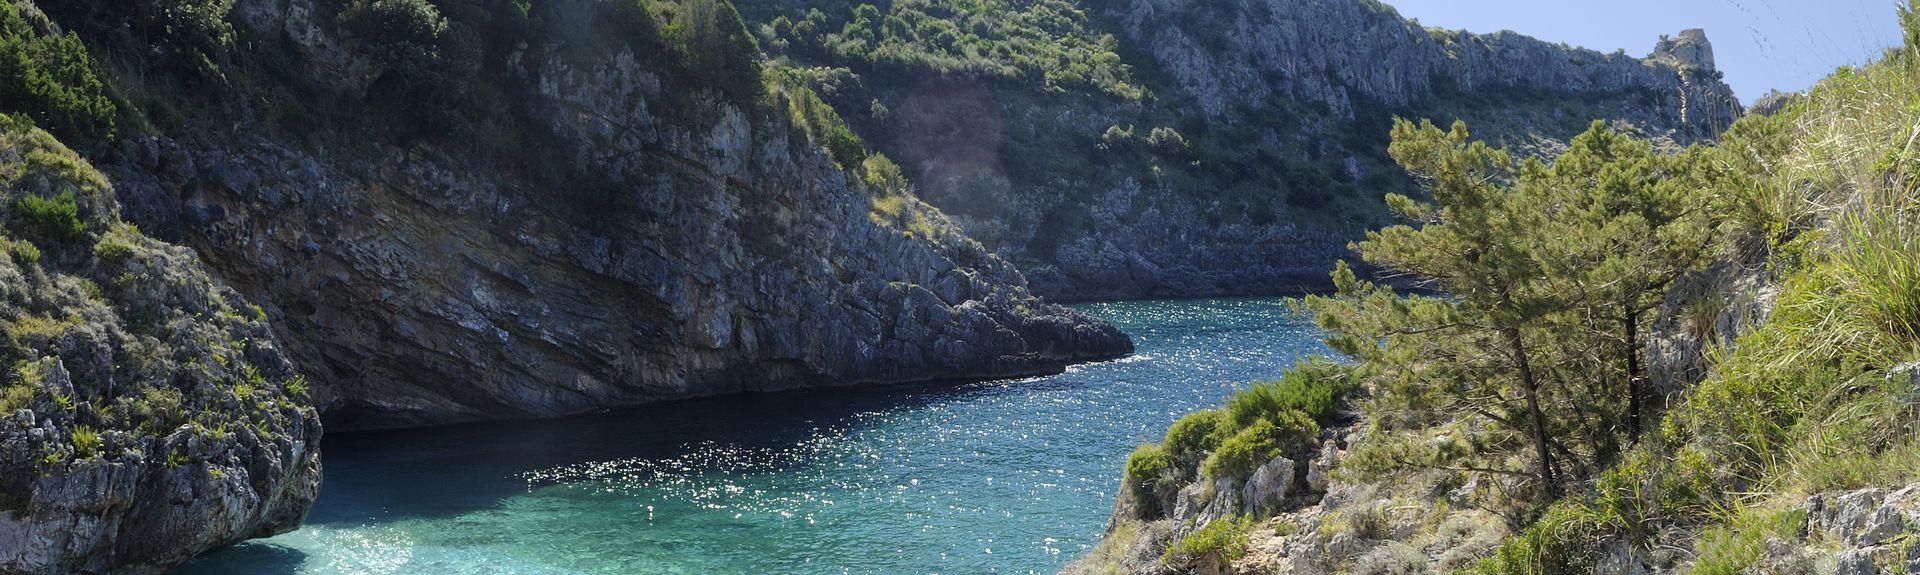 Pisciotta, Campania, Italy